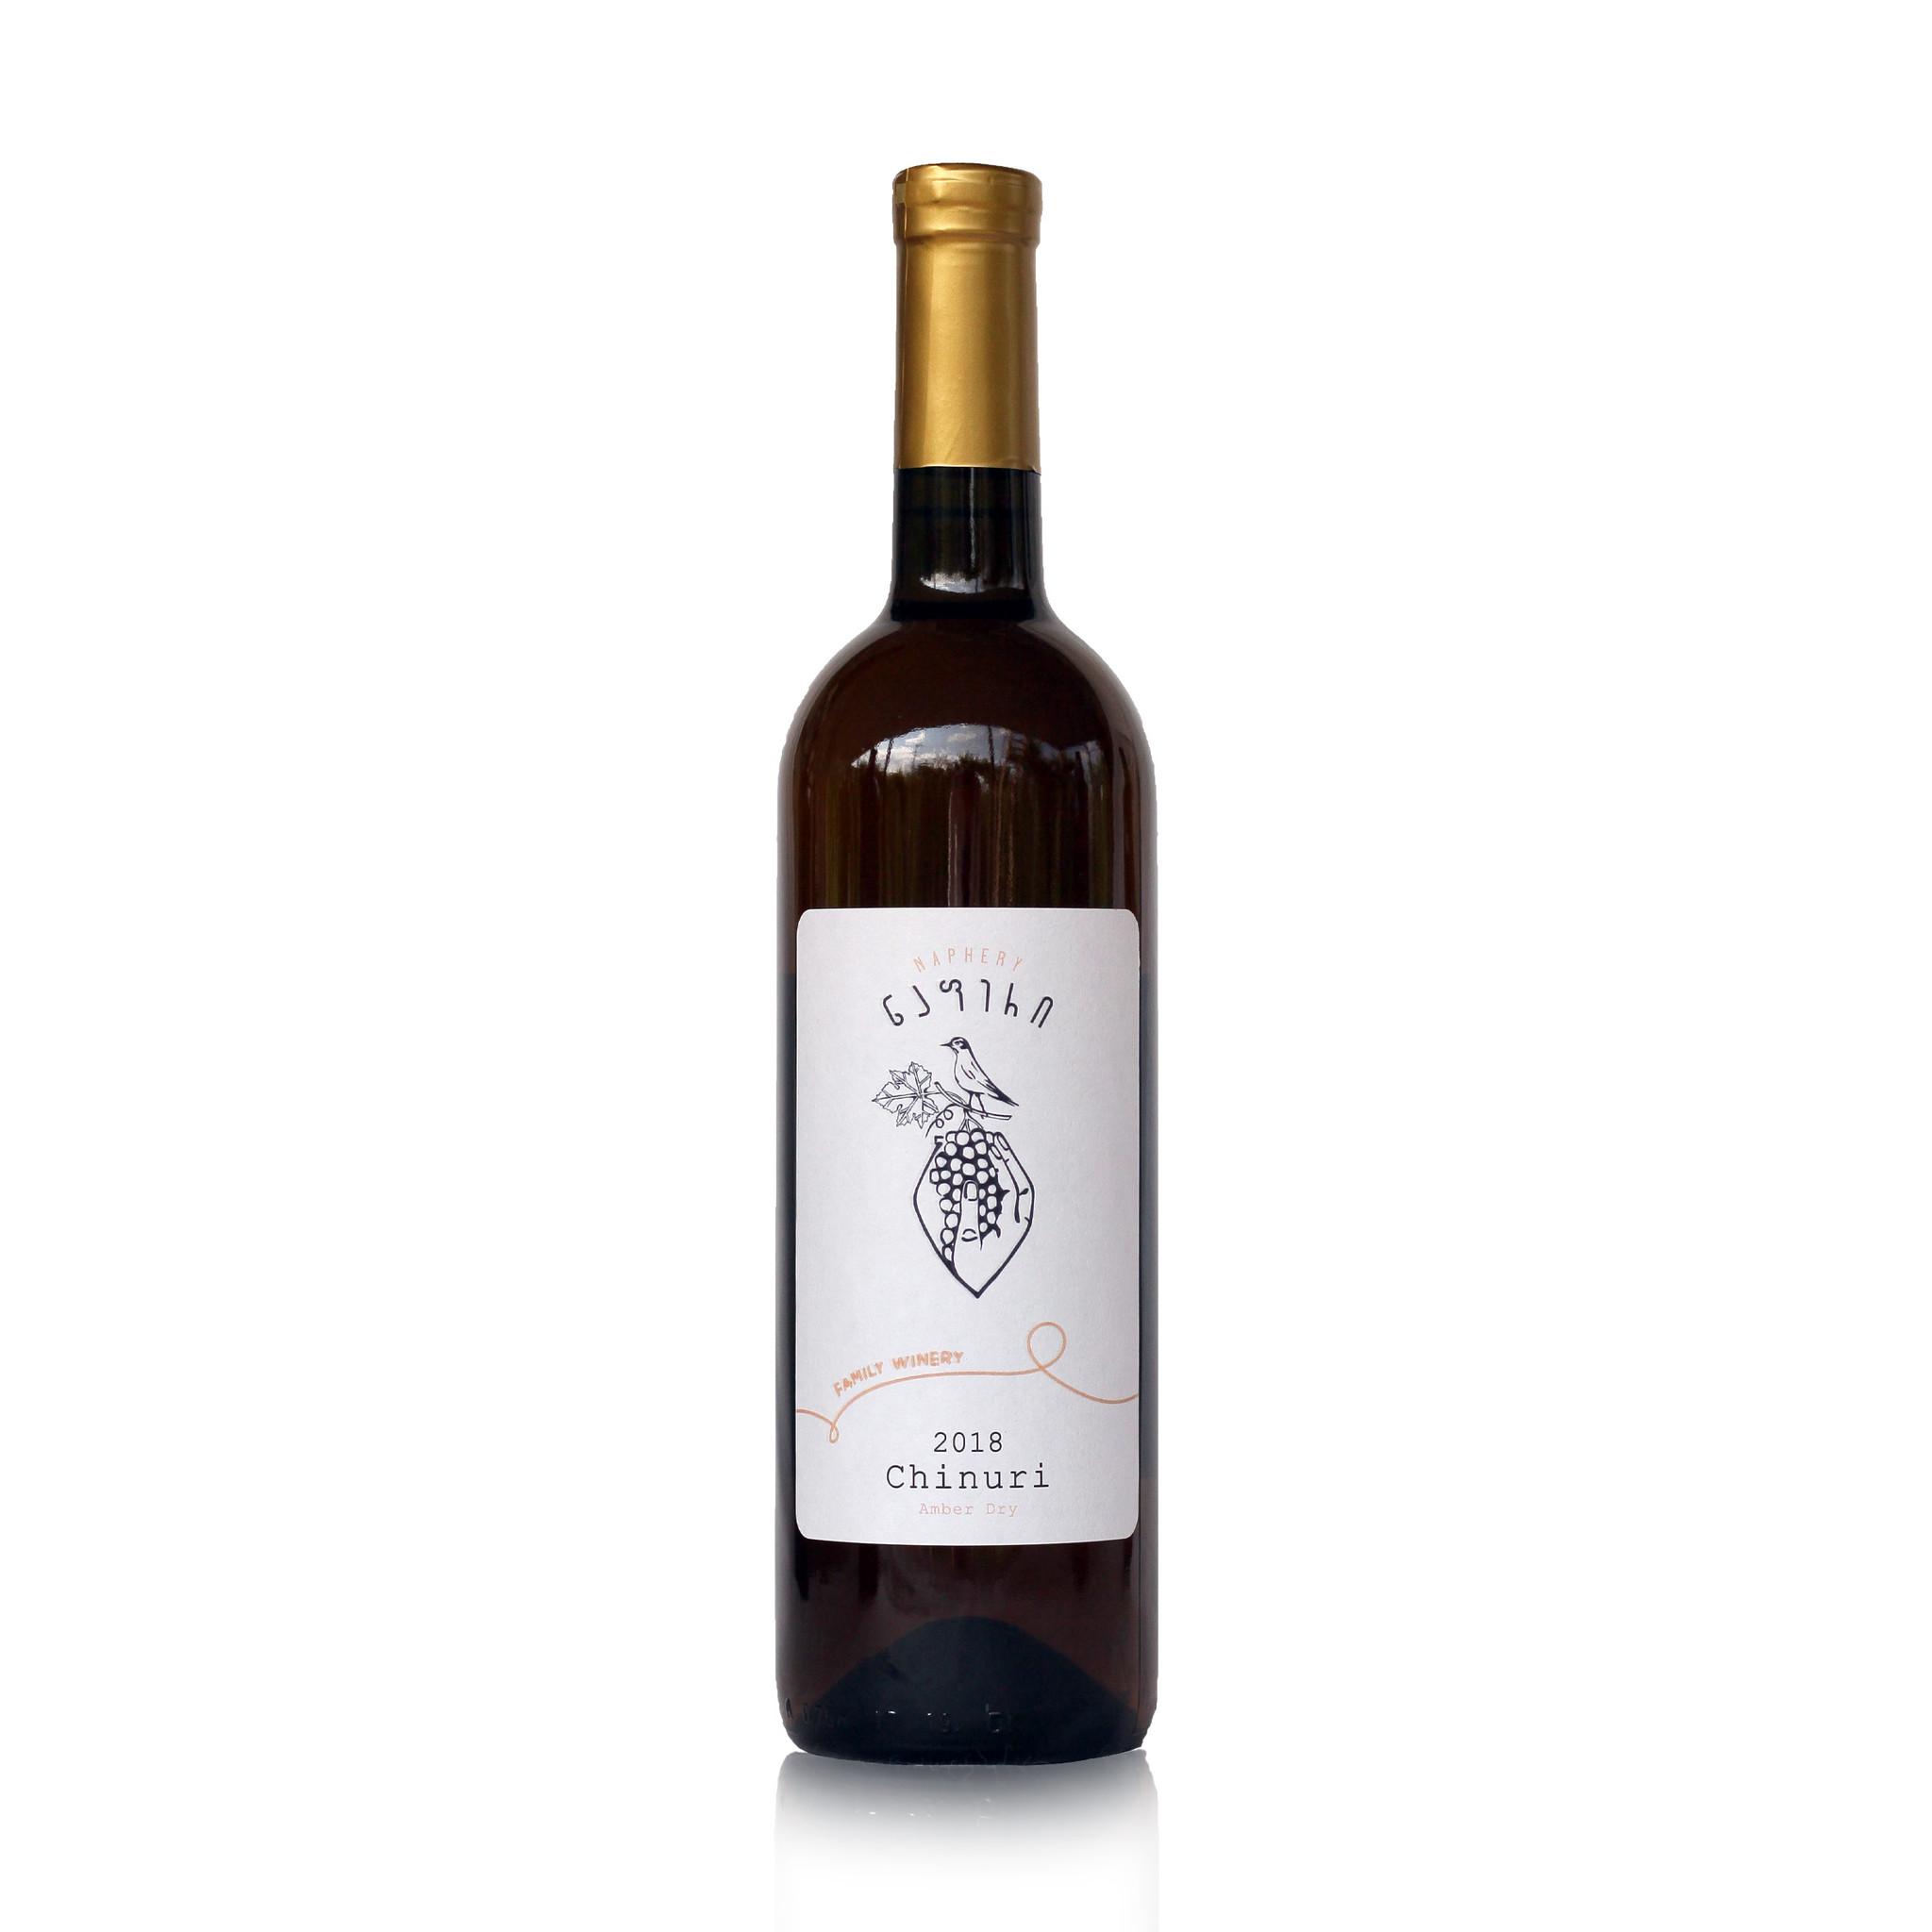 Napheri Napheri Chinuri Qvevri wine 2018